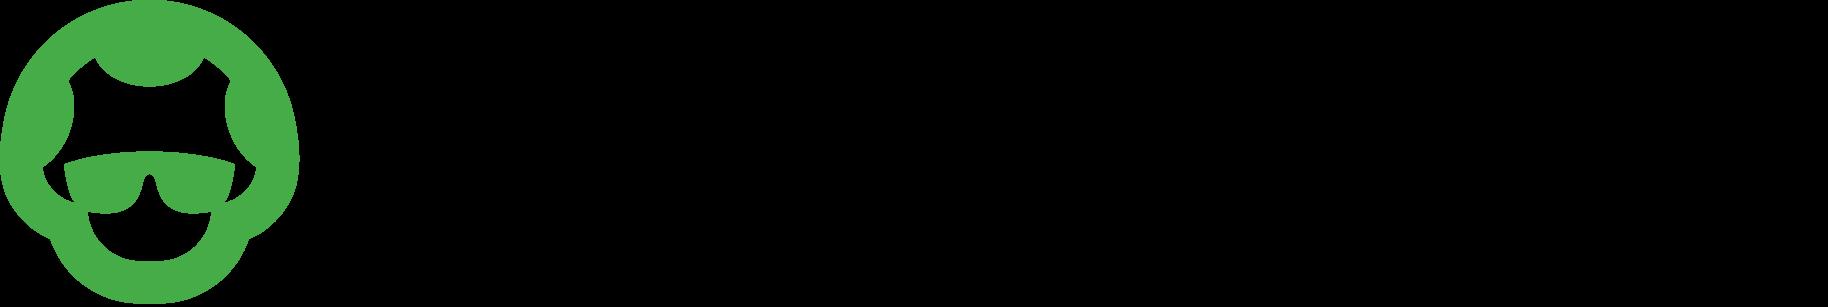 Petovera